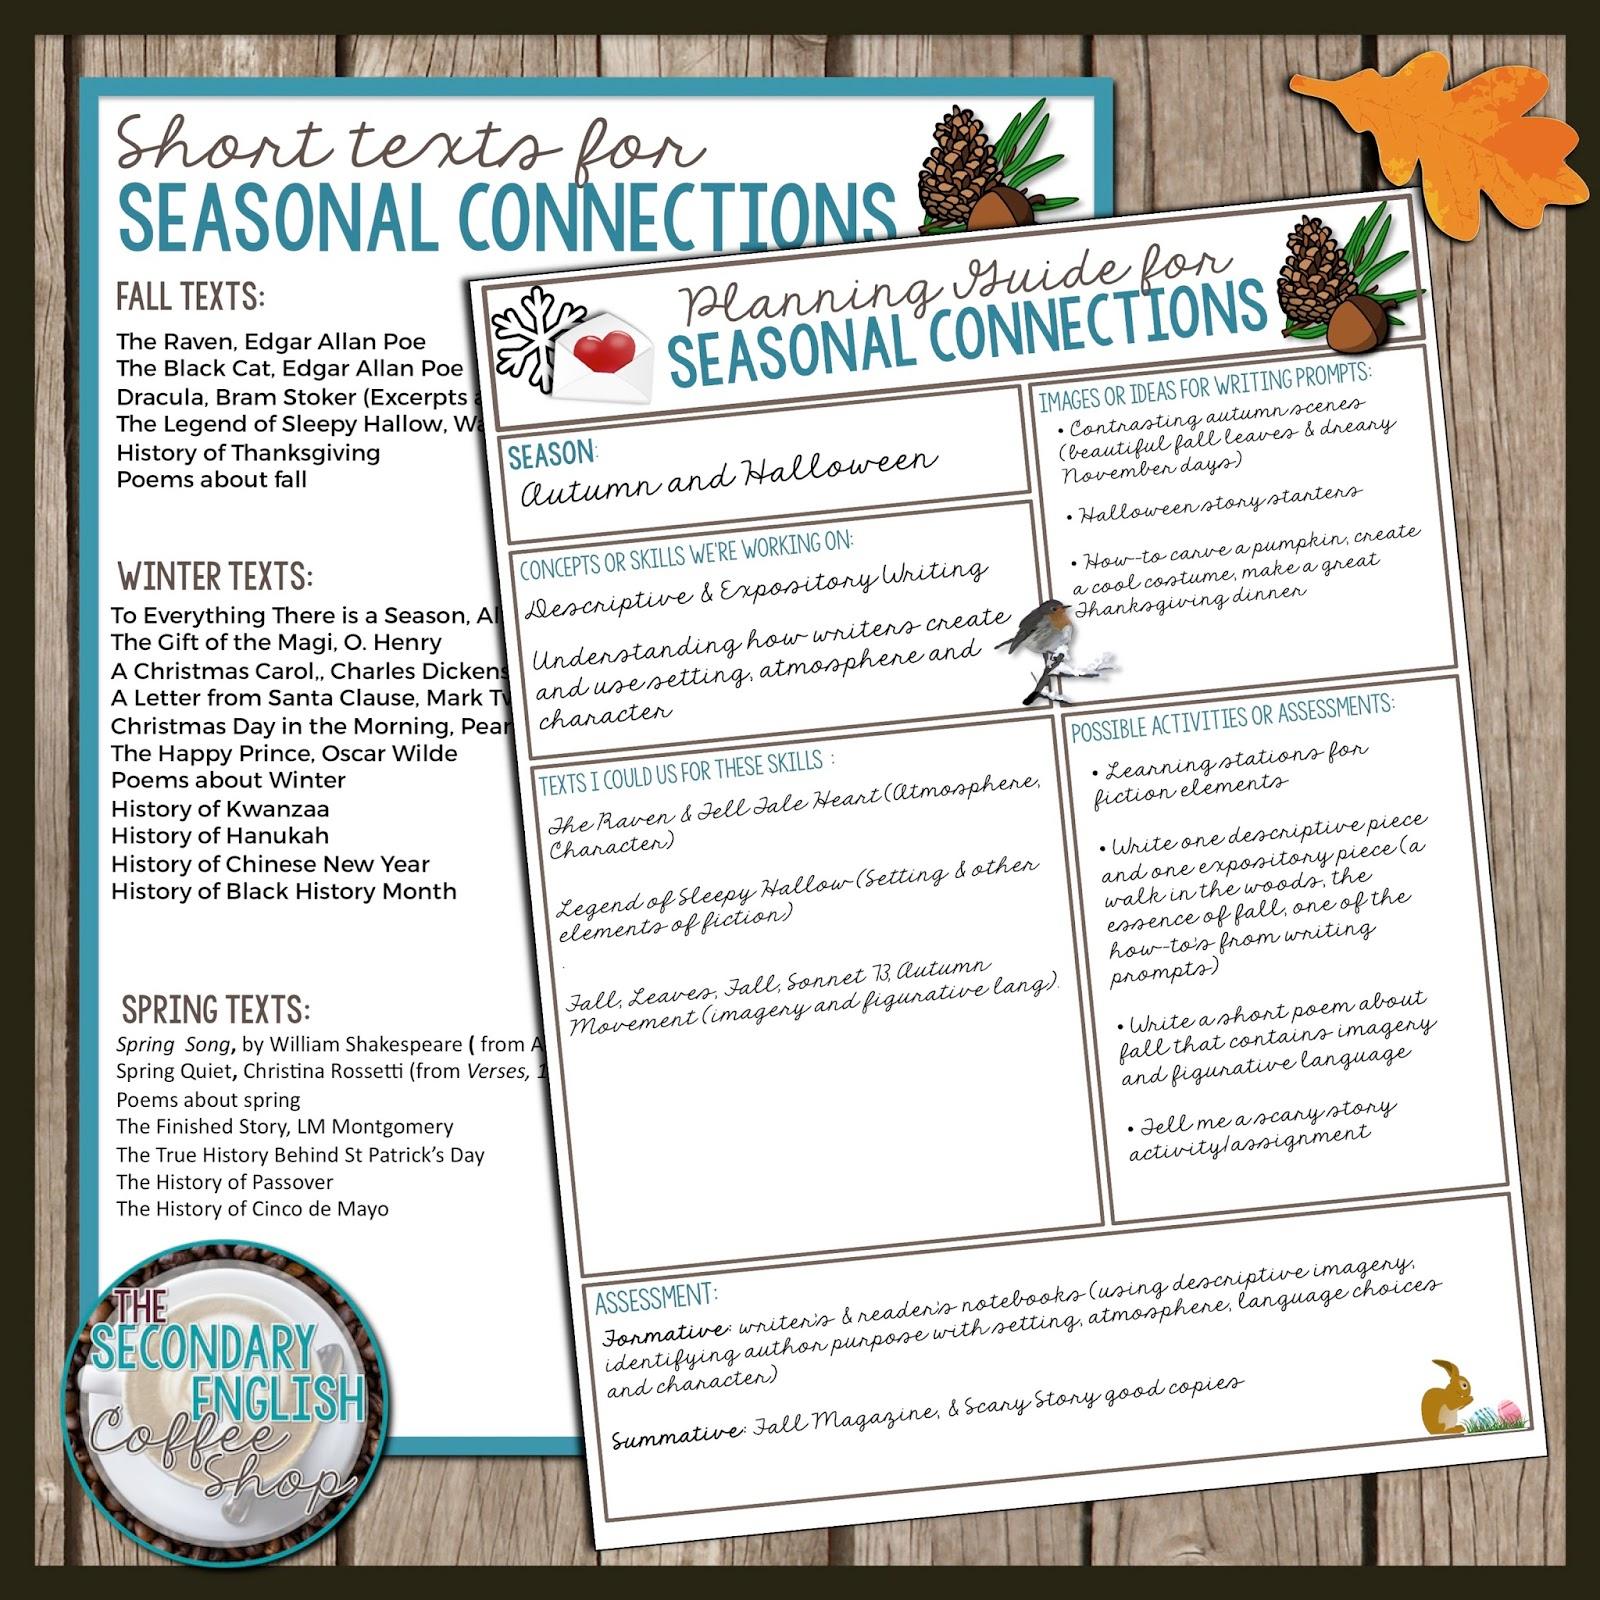 Seasonal Fun For Secondary Teachers - The Secondary English